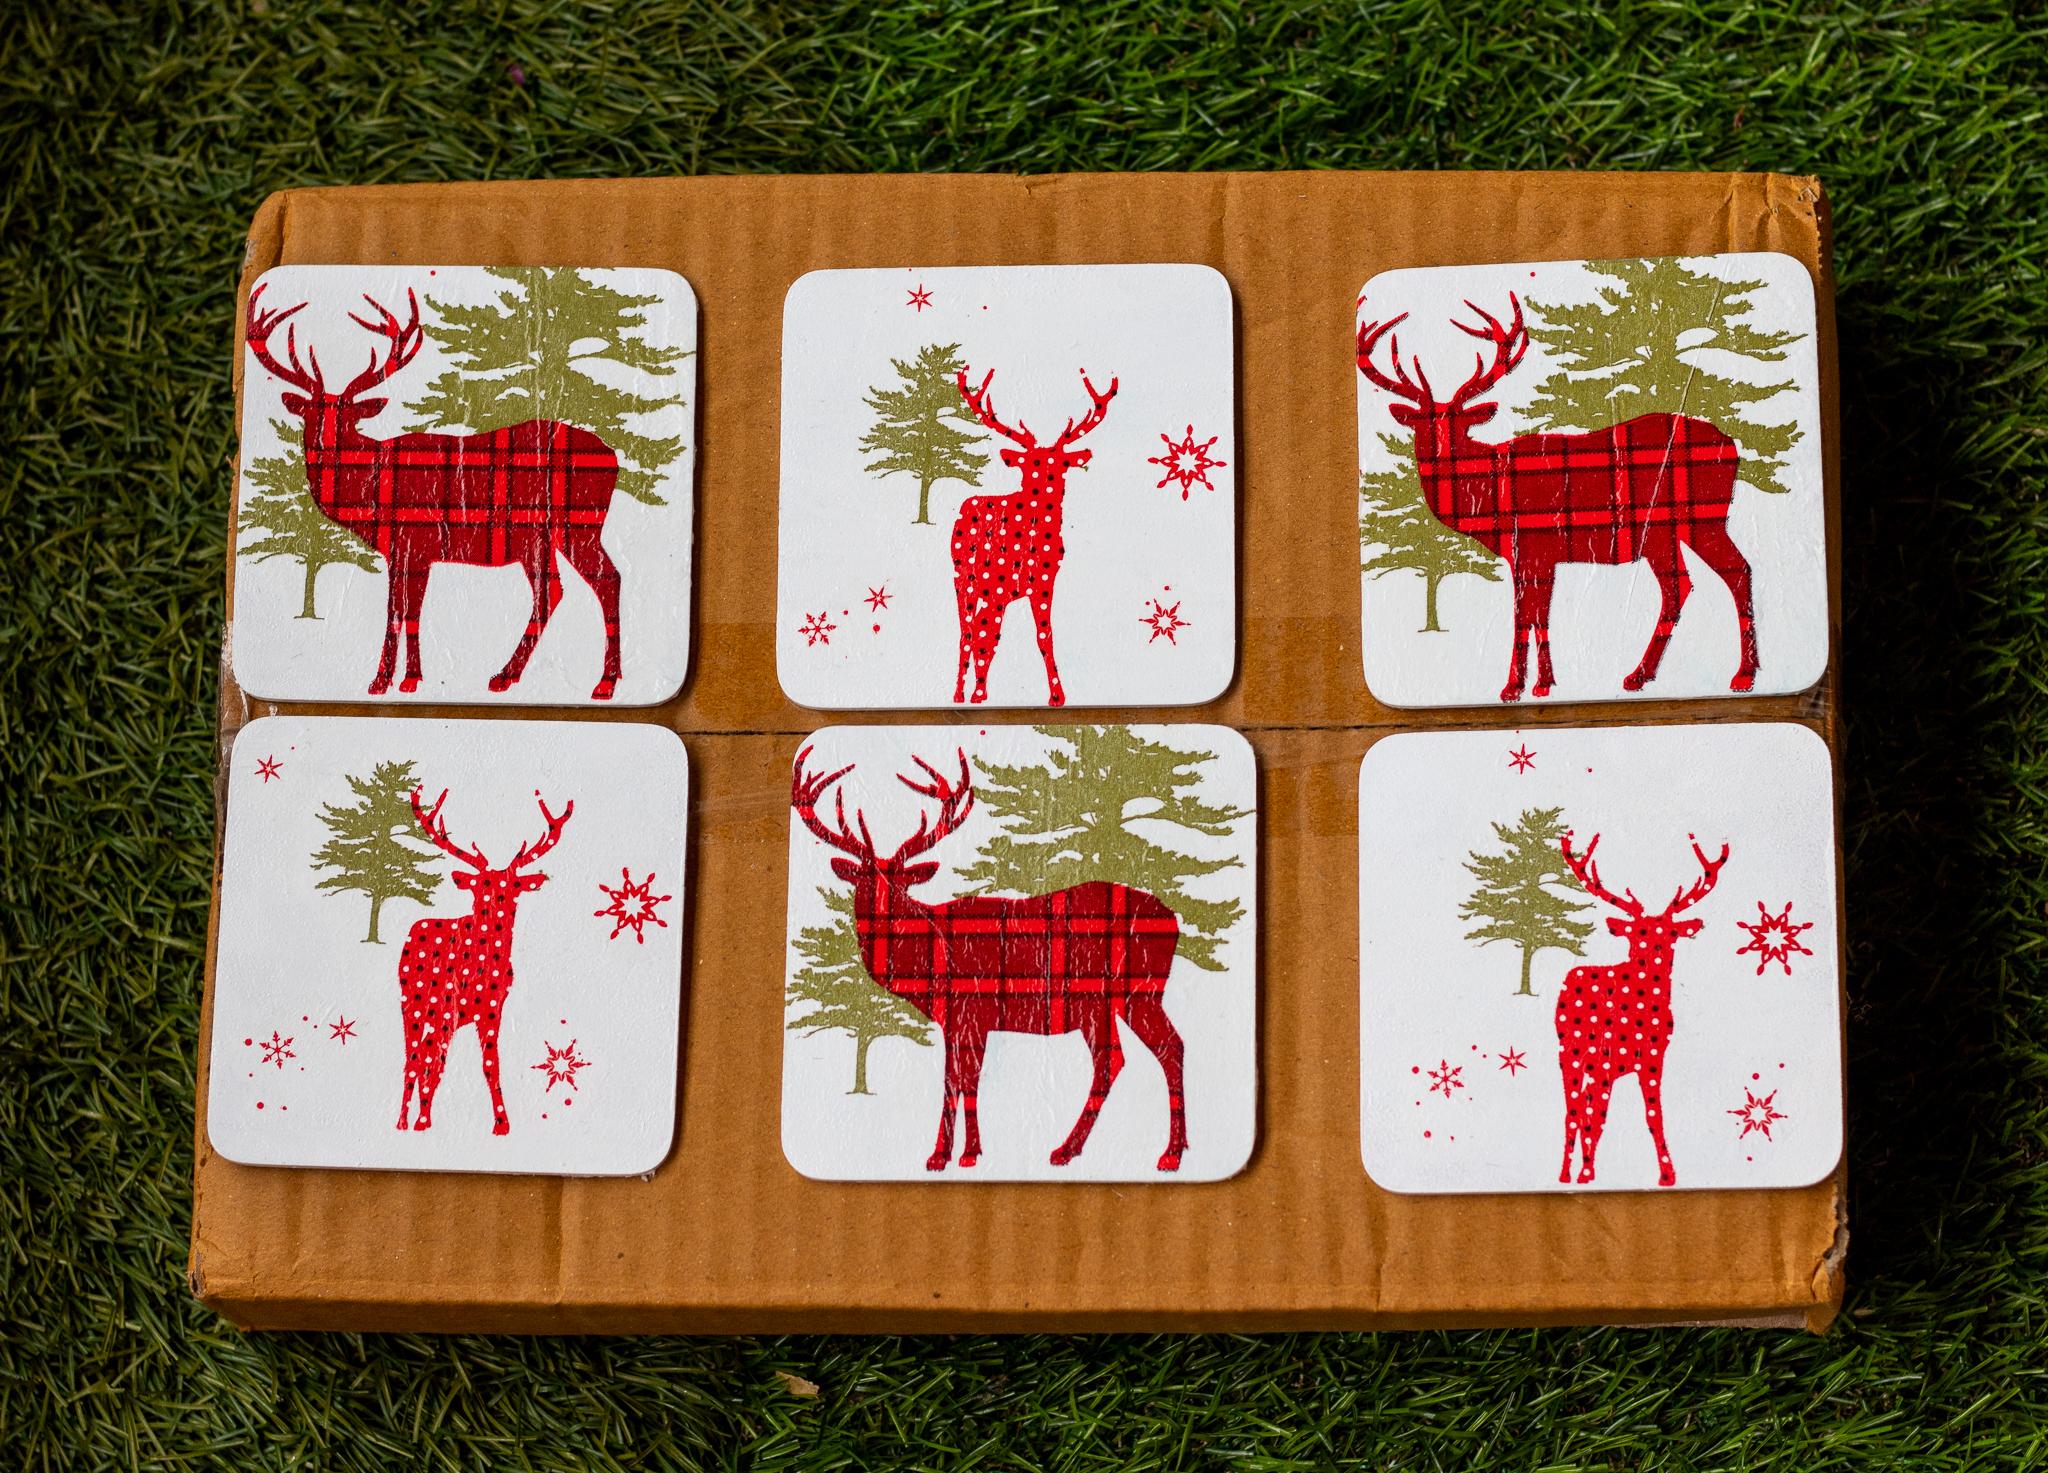 Christmas themed Coaster set.